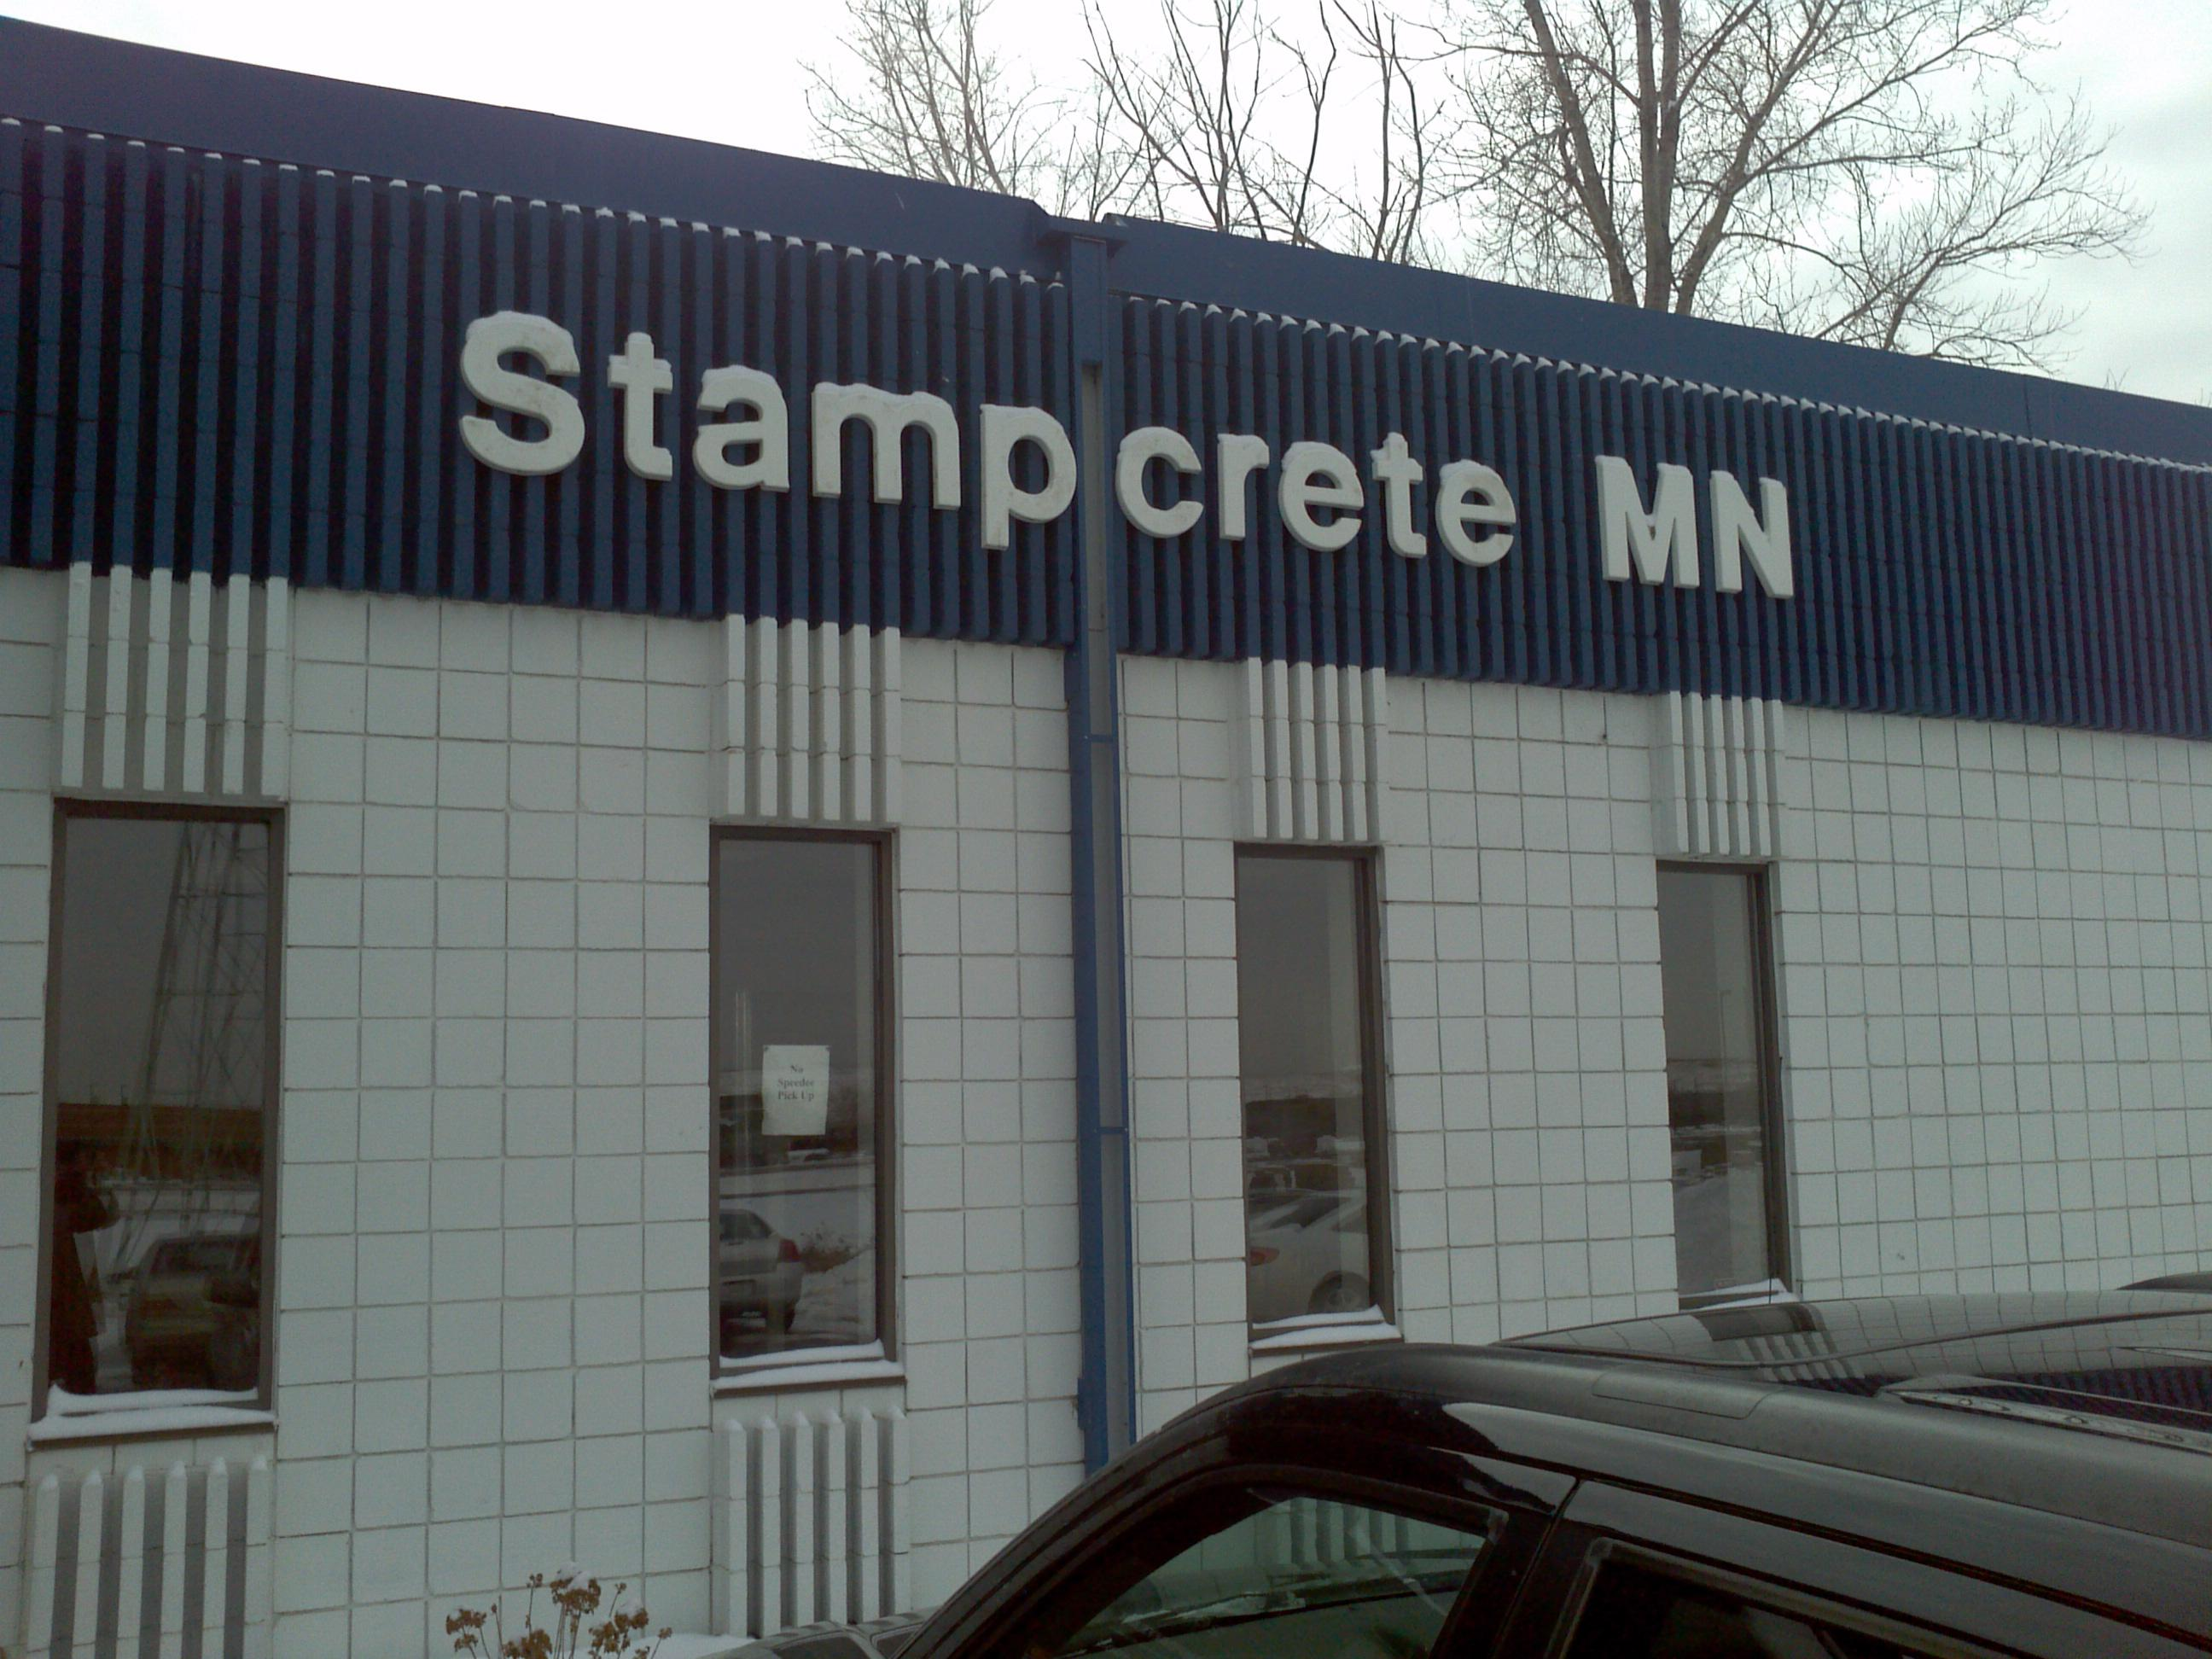 Stampcrete Minnesota